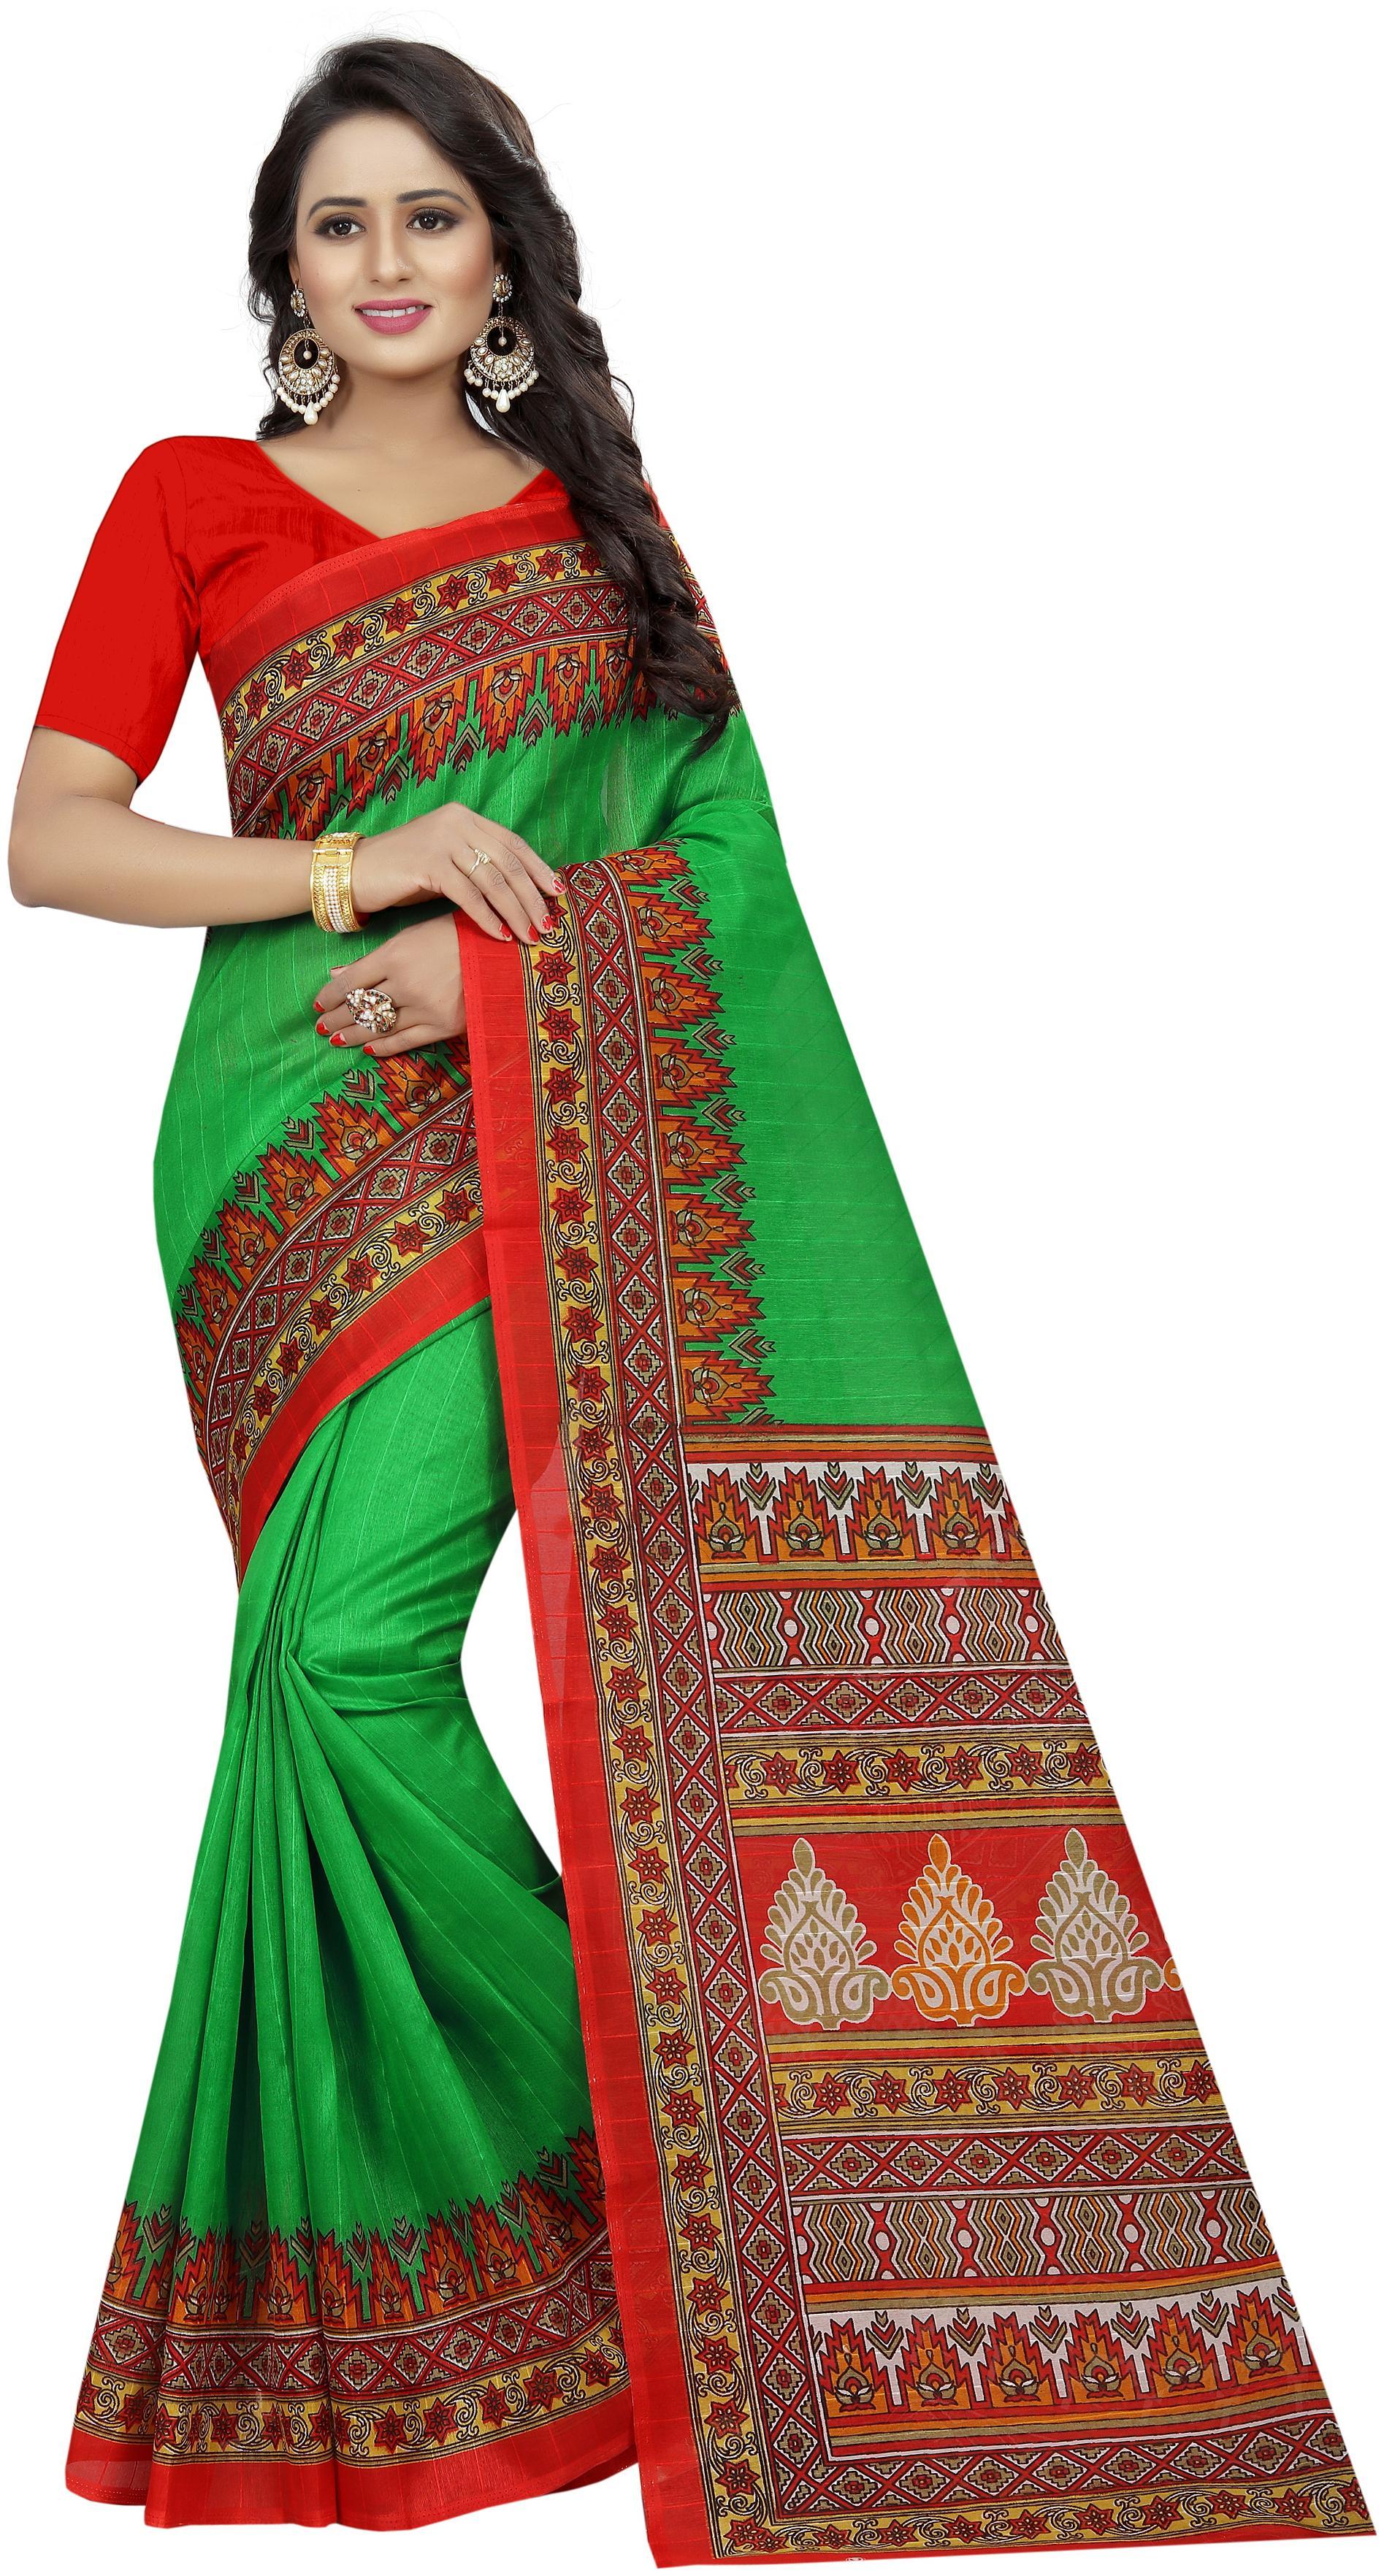 90691be05b https://assetscdn1.paytm.com/images/catalog/product/. Shree Maruti  Enterprise Bhagalpuri Khadi ...